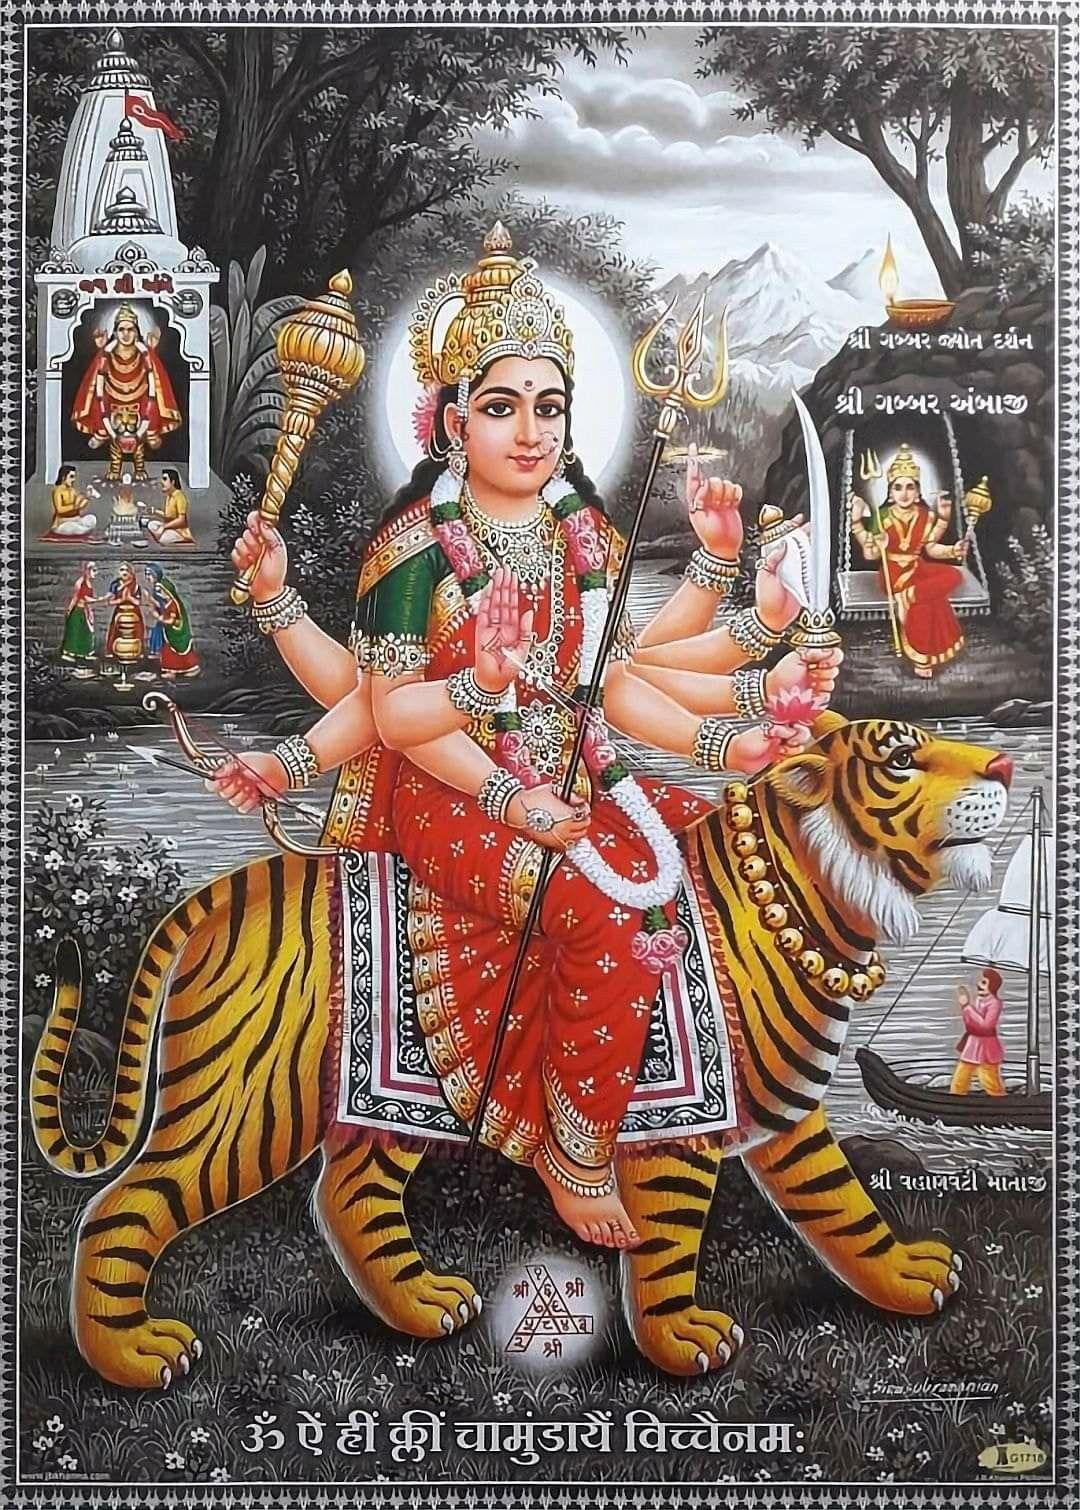 Pin By Shree Shyam On Jai Maa Durge Durga Durga Kali Durga Picture